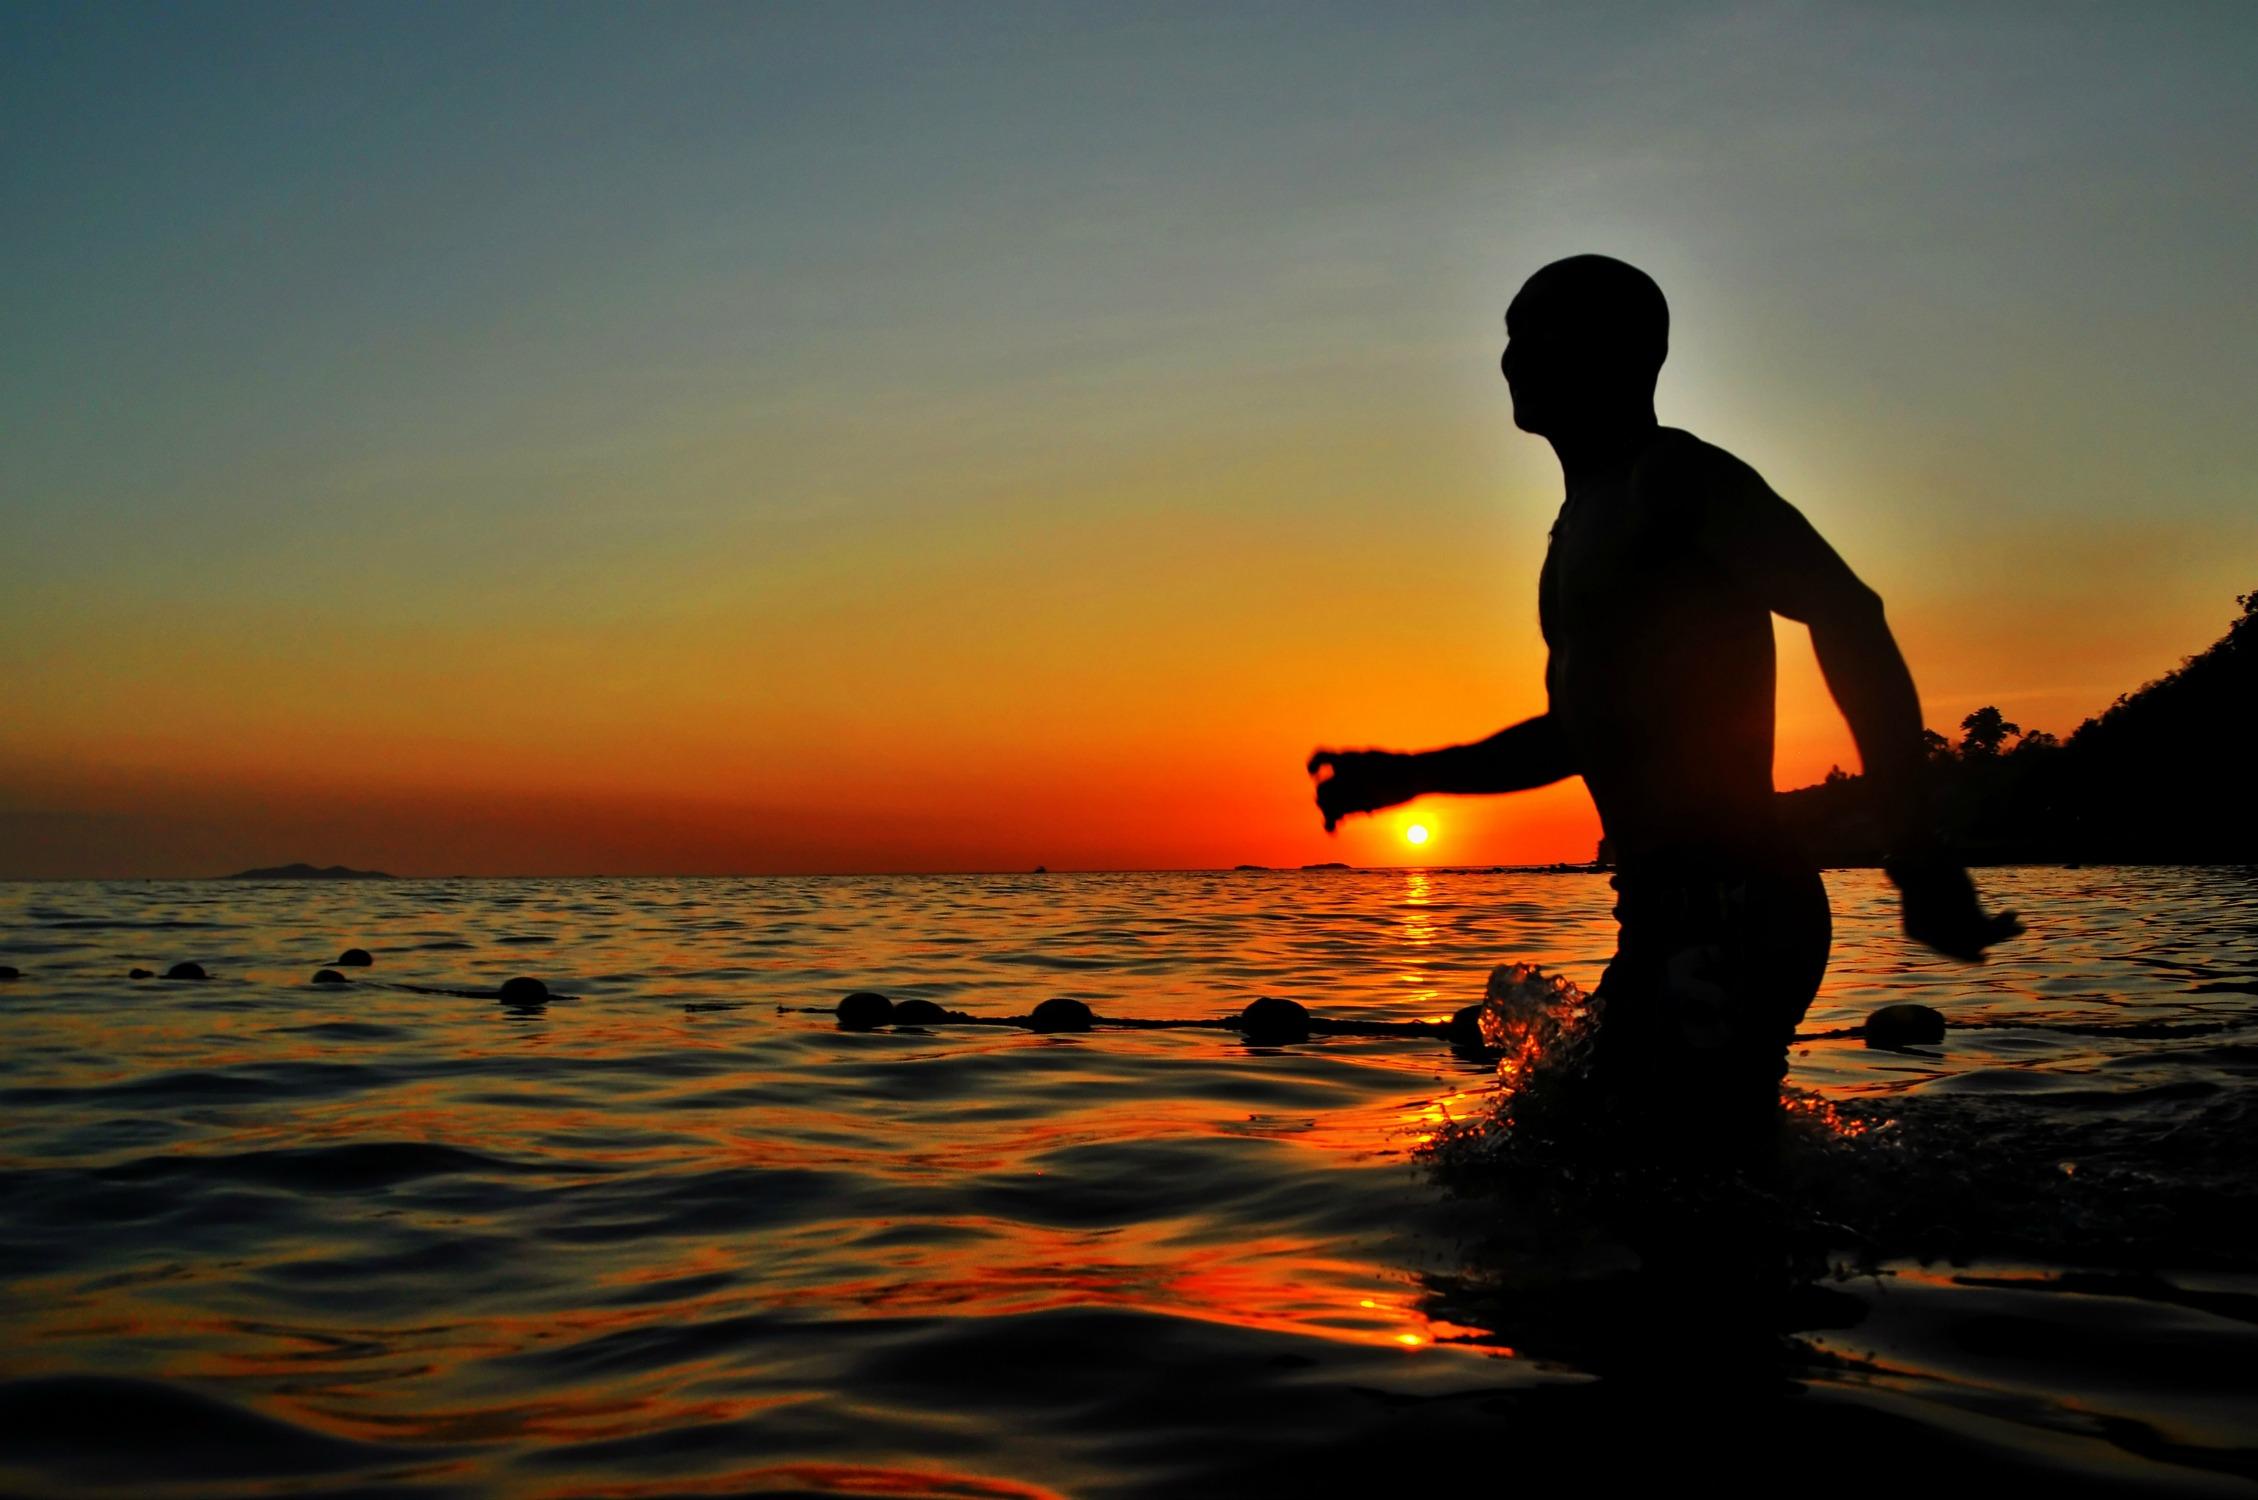 adventure-sunsetwaves.jpg